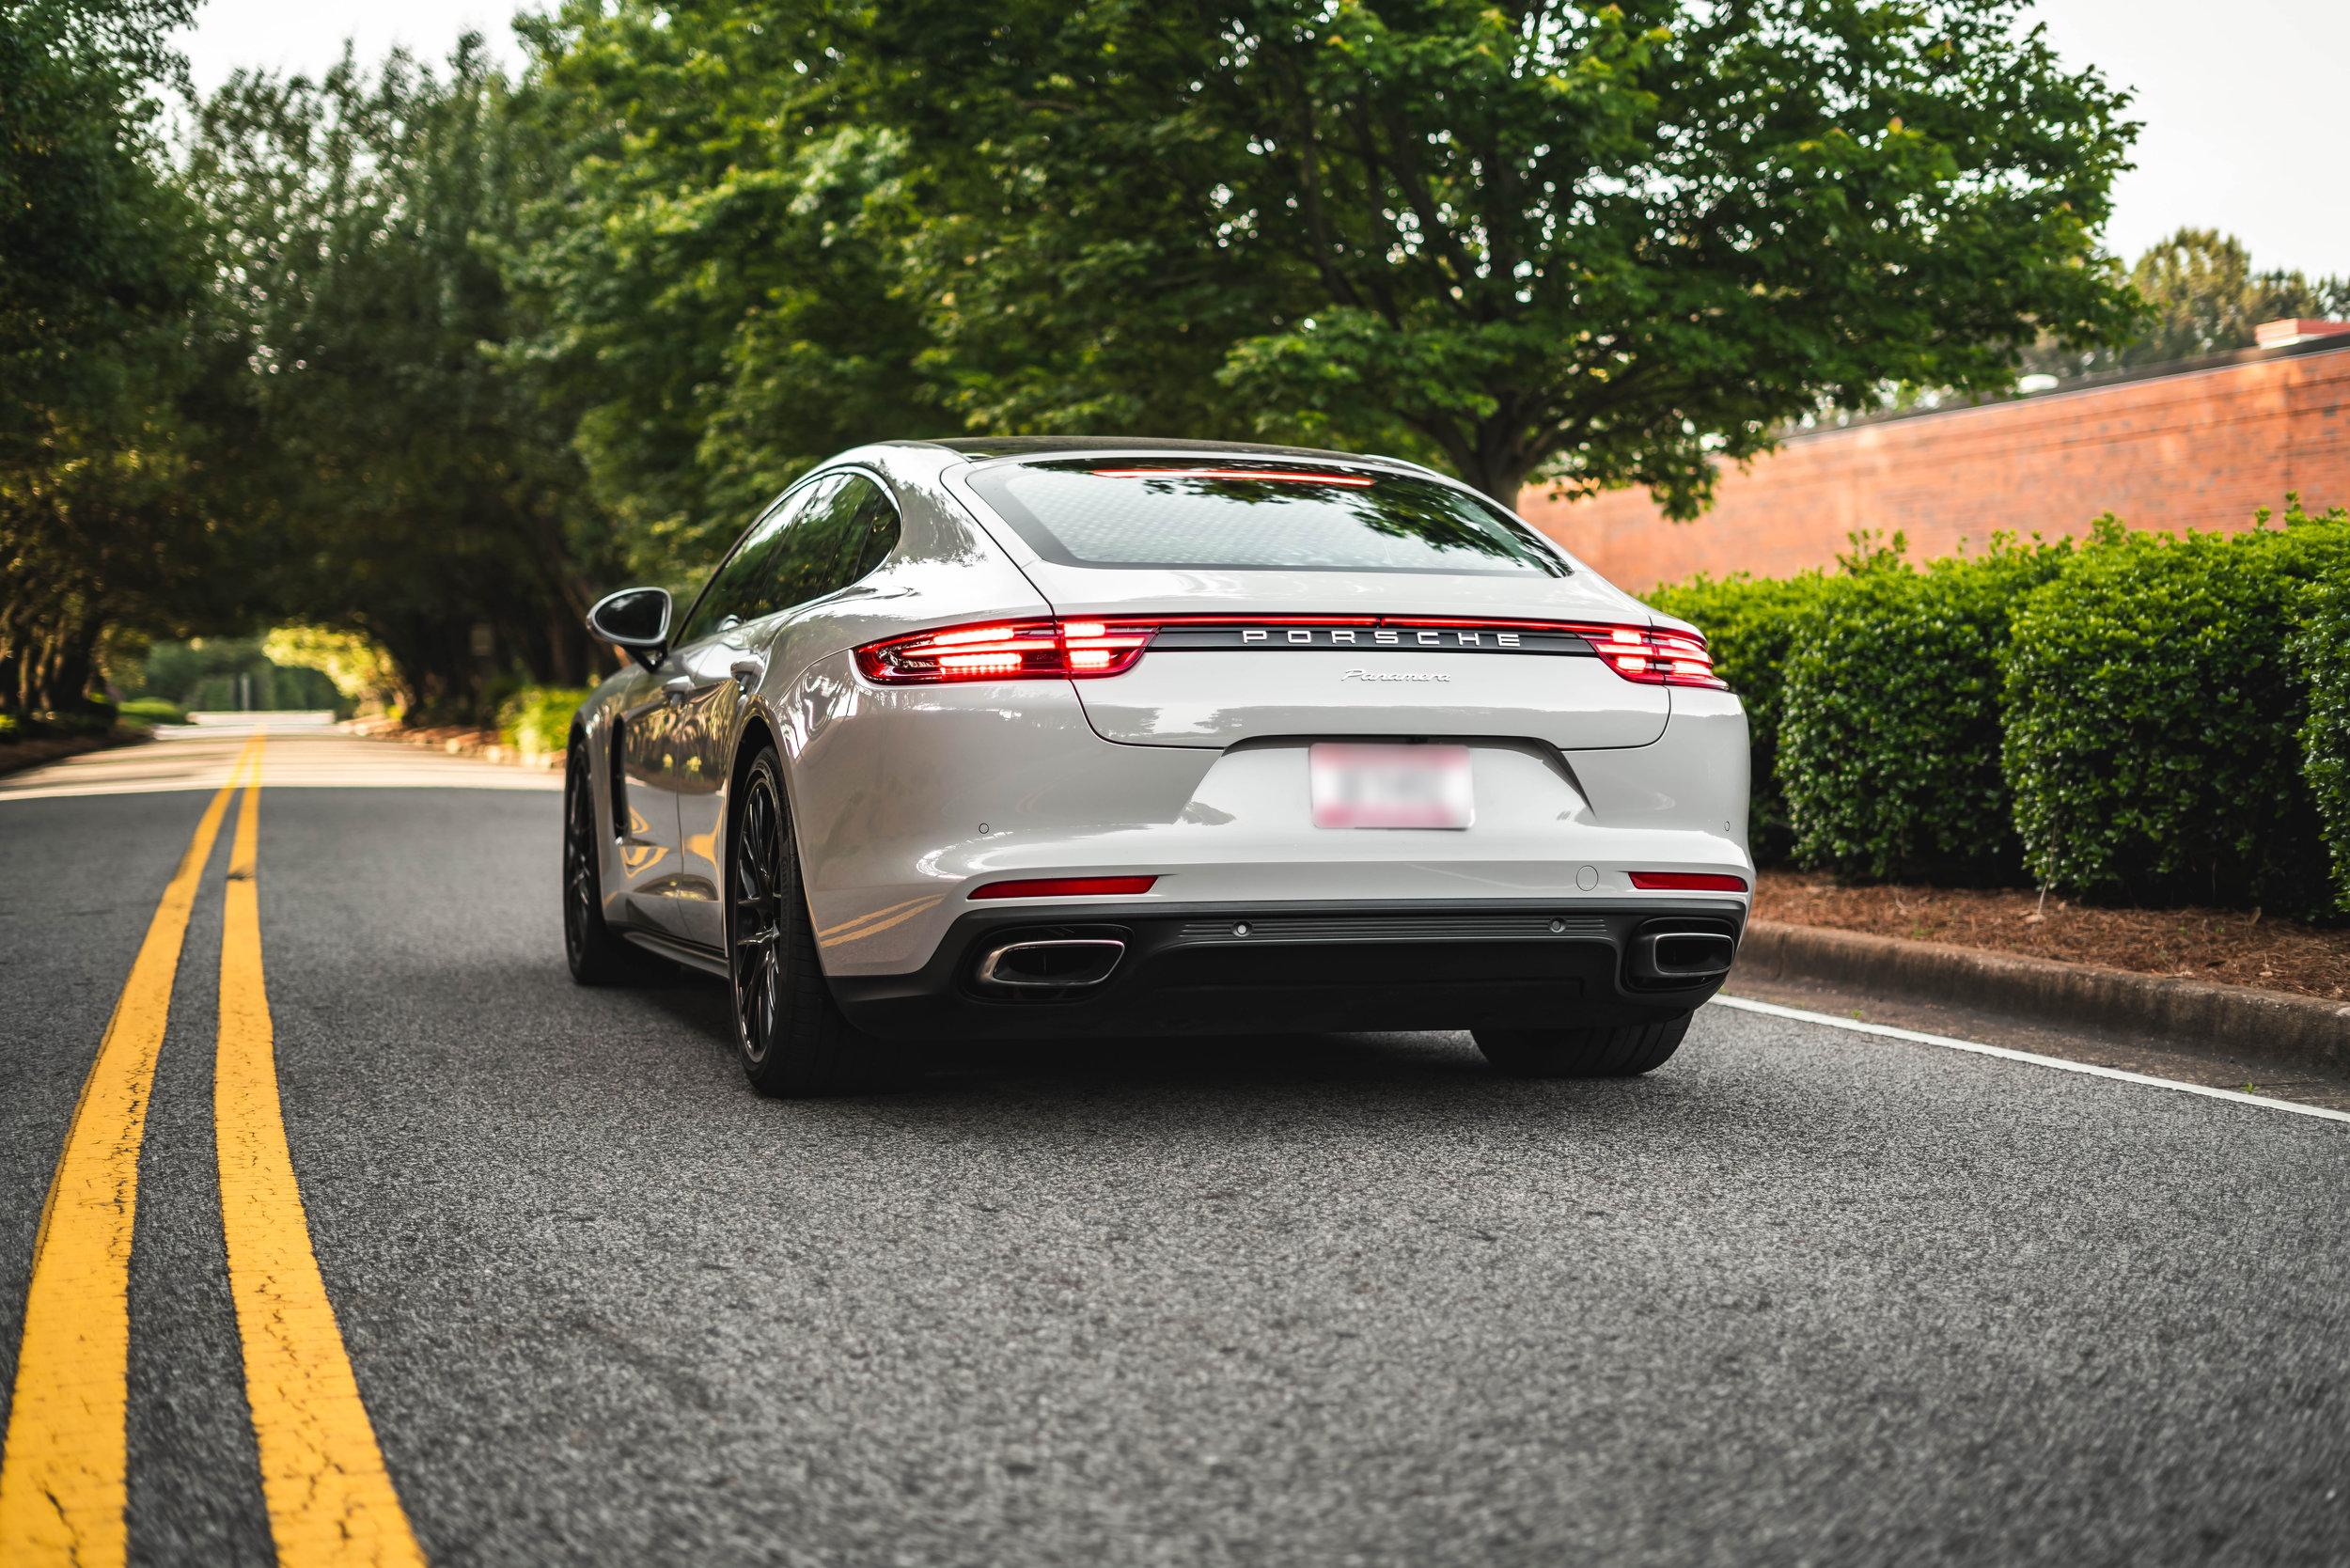 20190504 Porsche-1 Blur.jpg